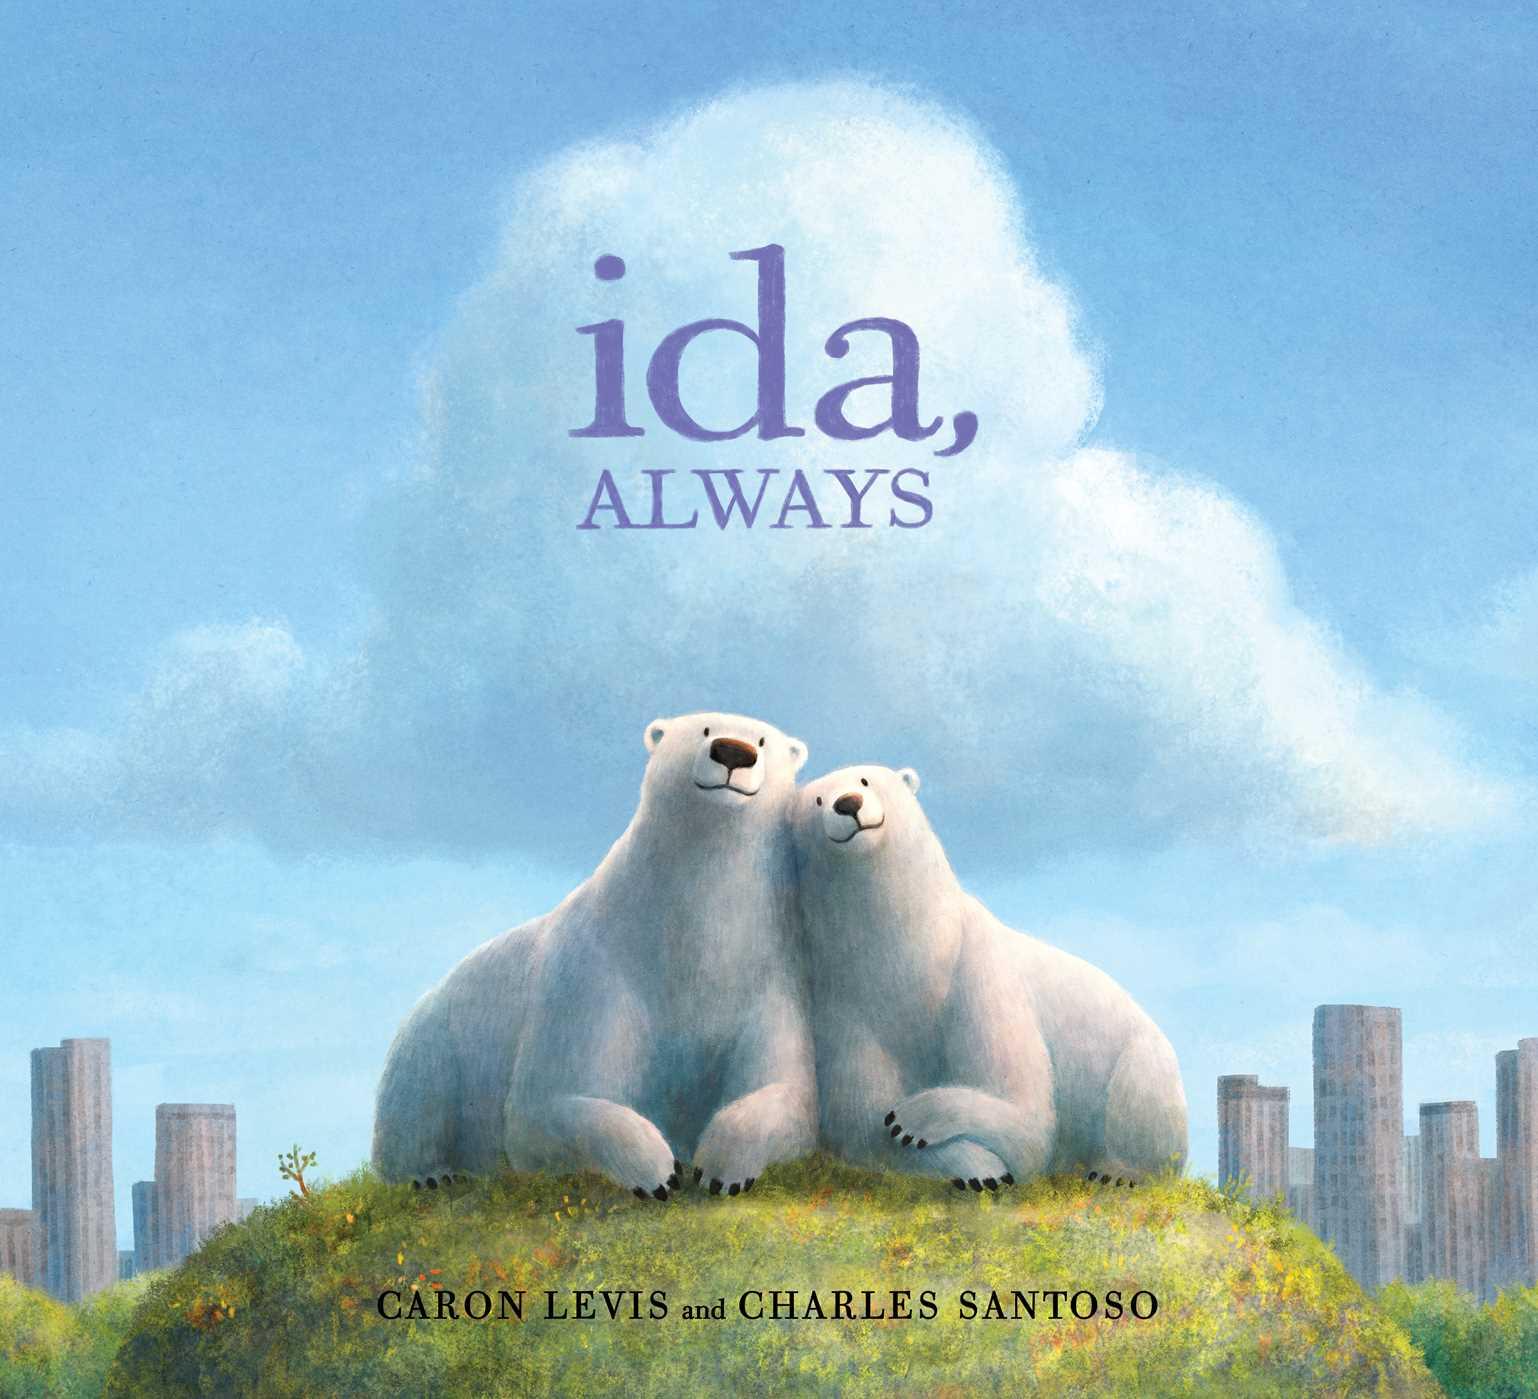 Ida always 9781481426404 hr